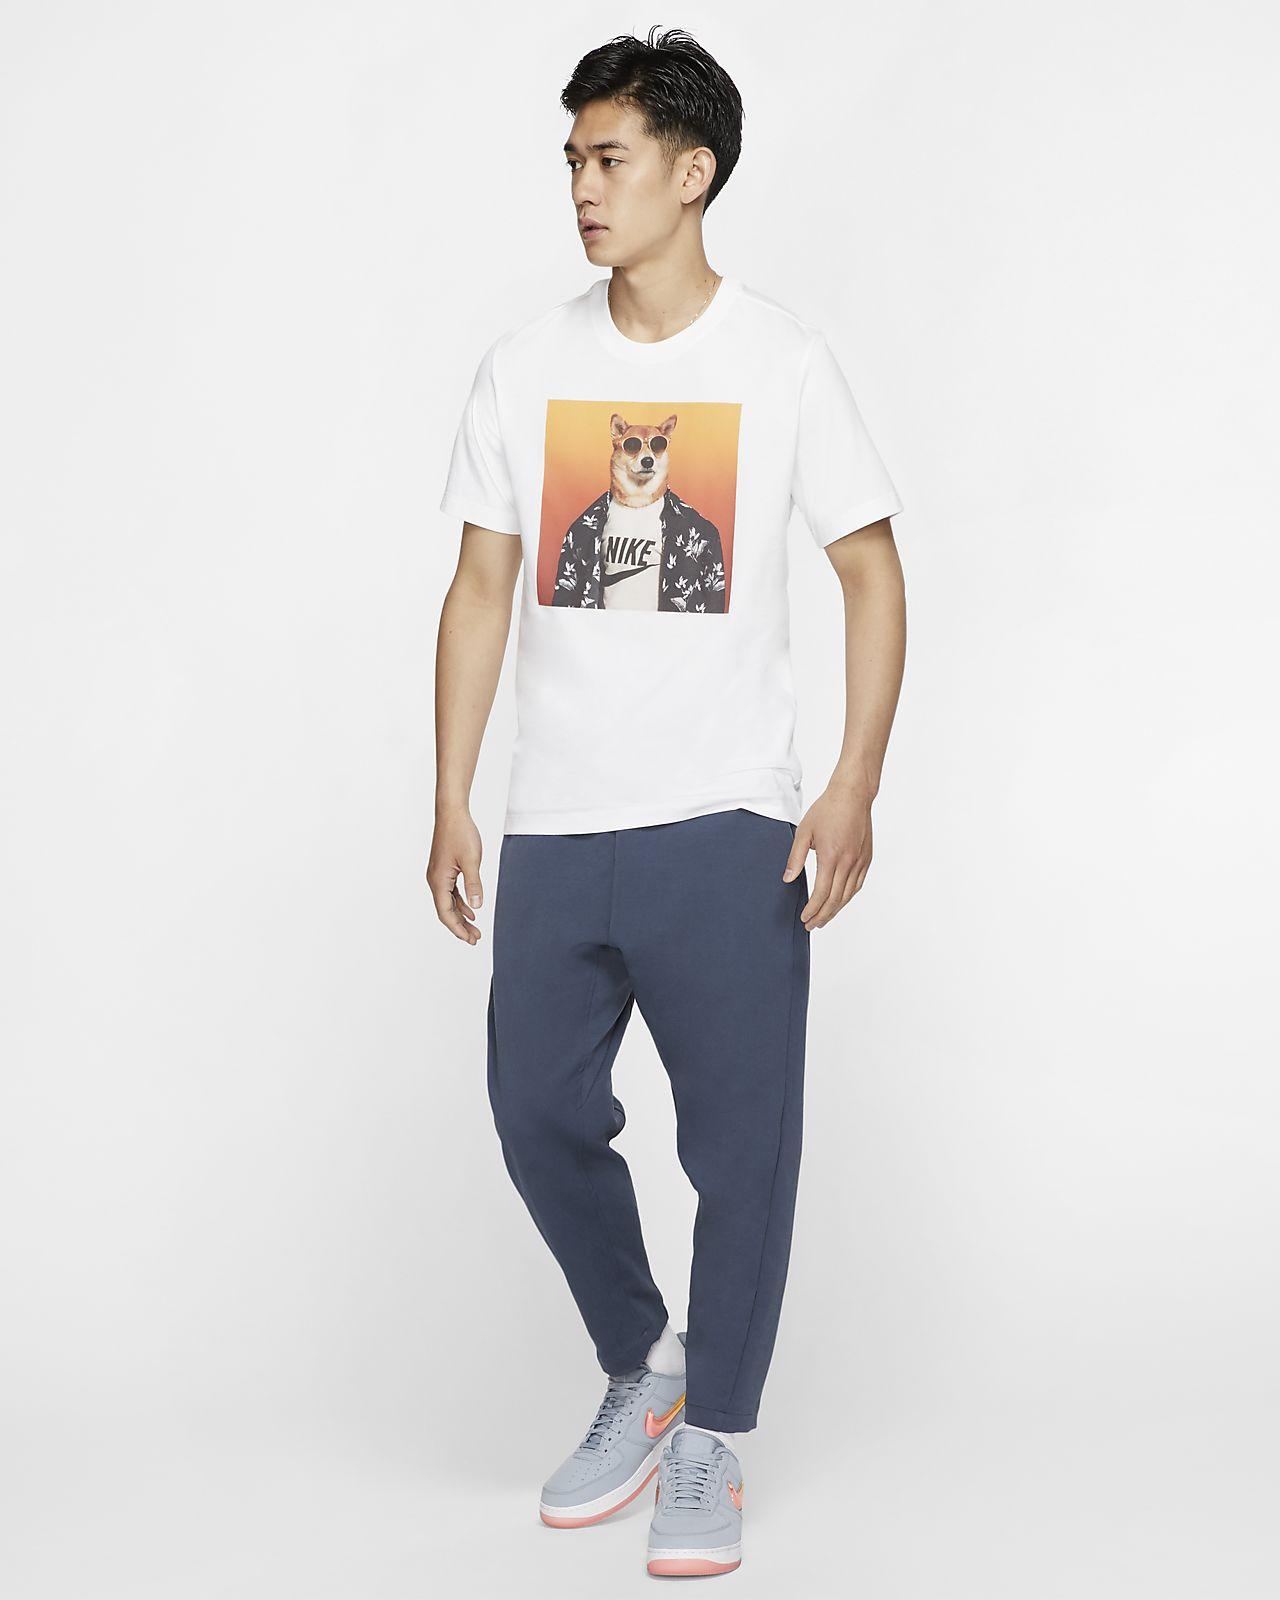 official photos 43a13 b1b71 ... Nike Sportswear Men s T-Shirt